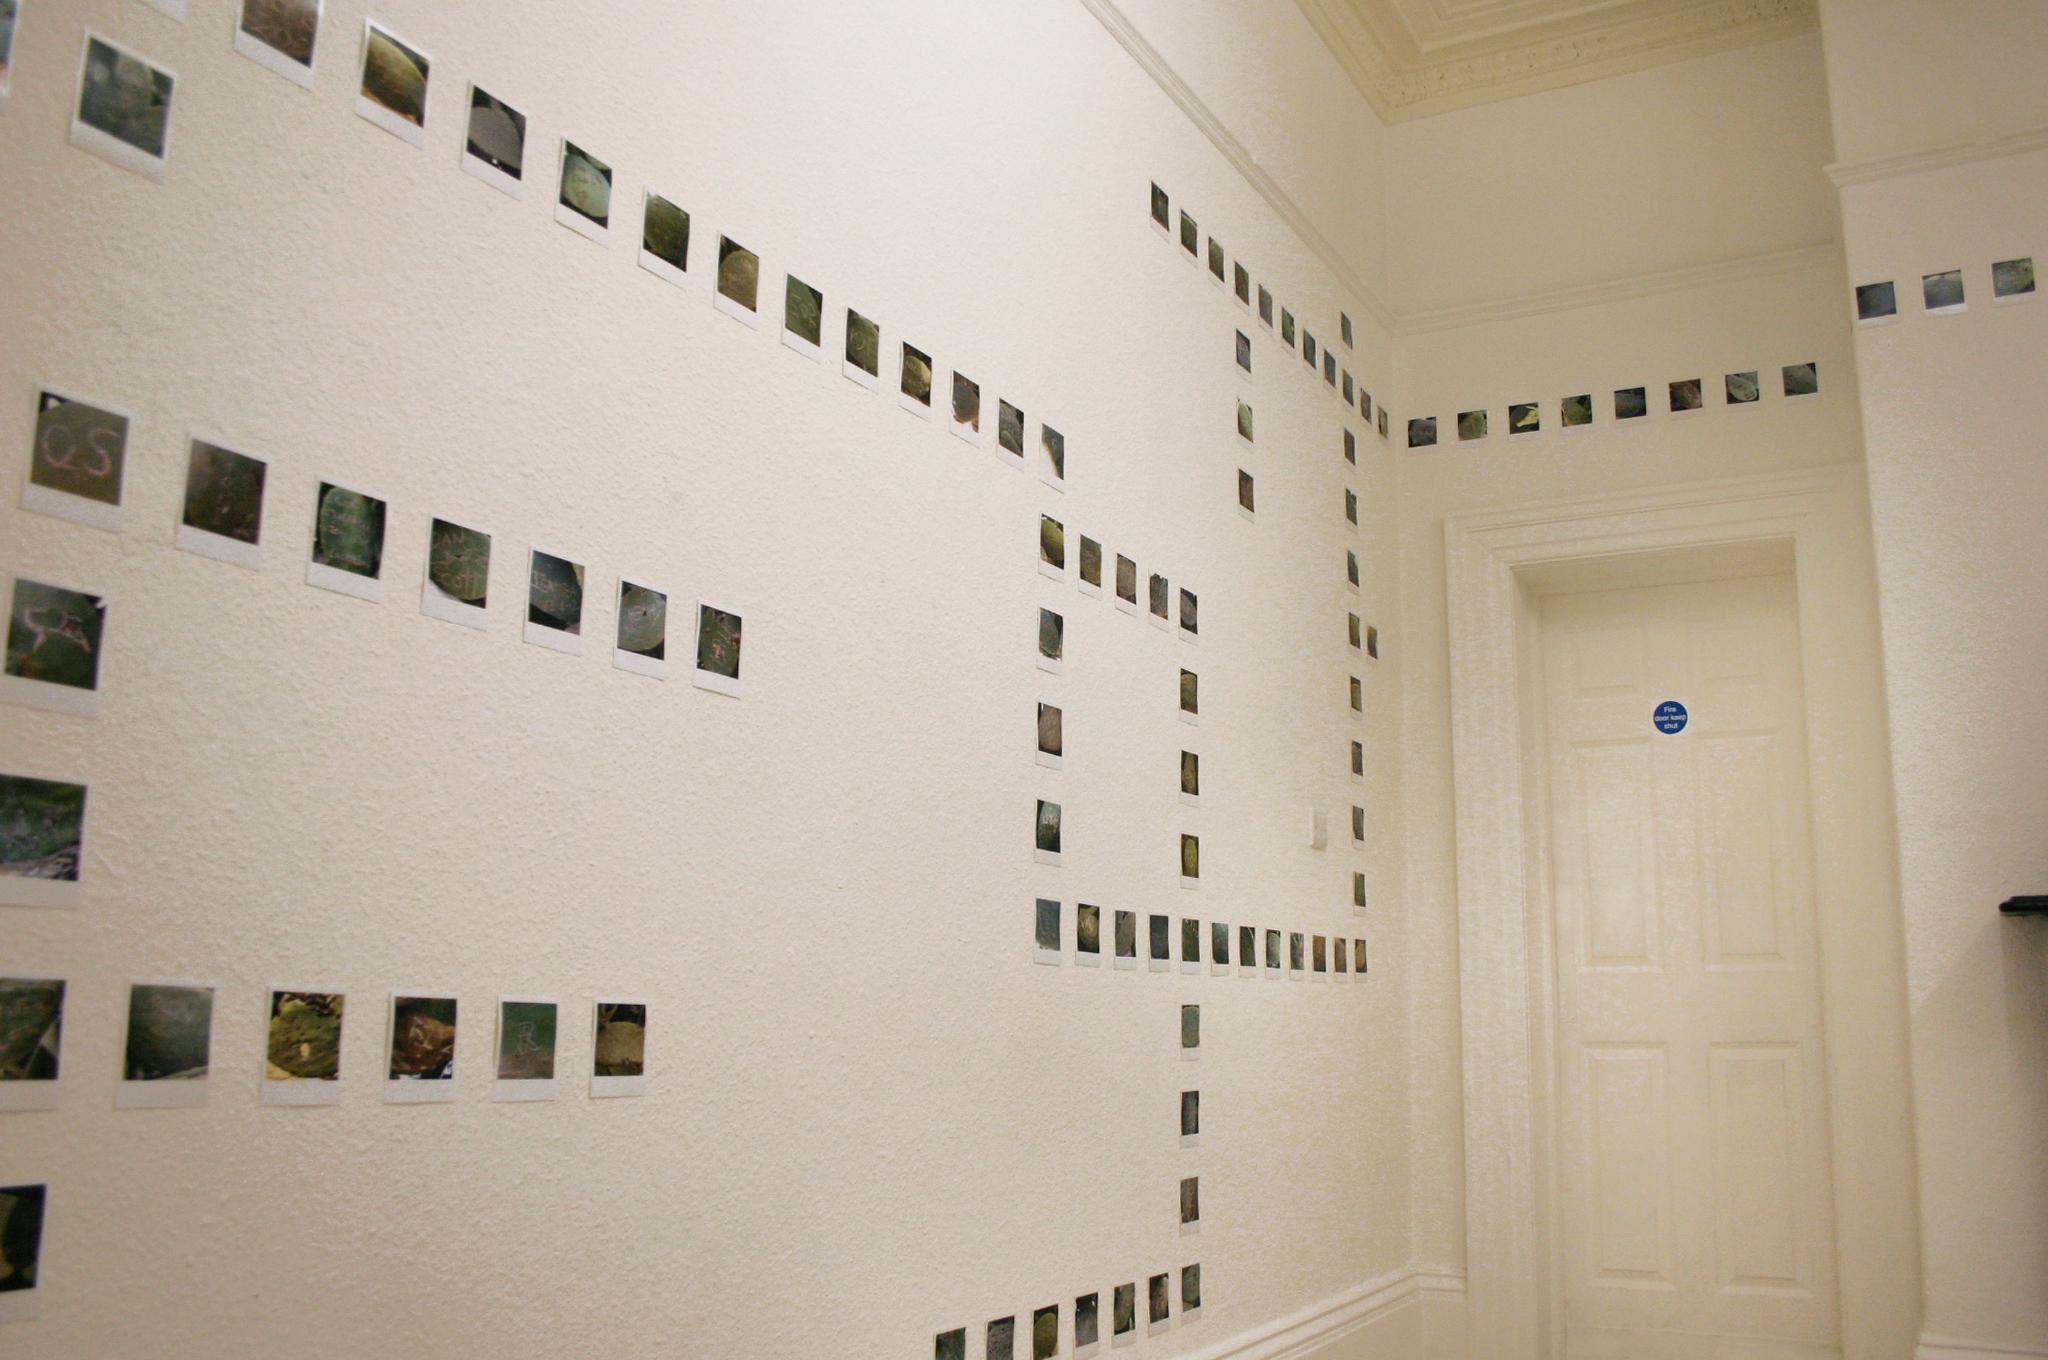 Pear Pressure  - Lifton Place, University of Leeds (2014).